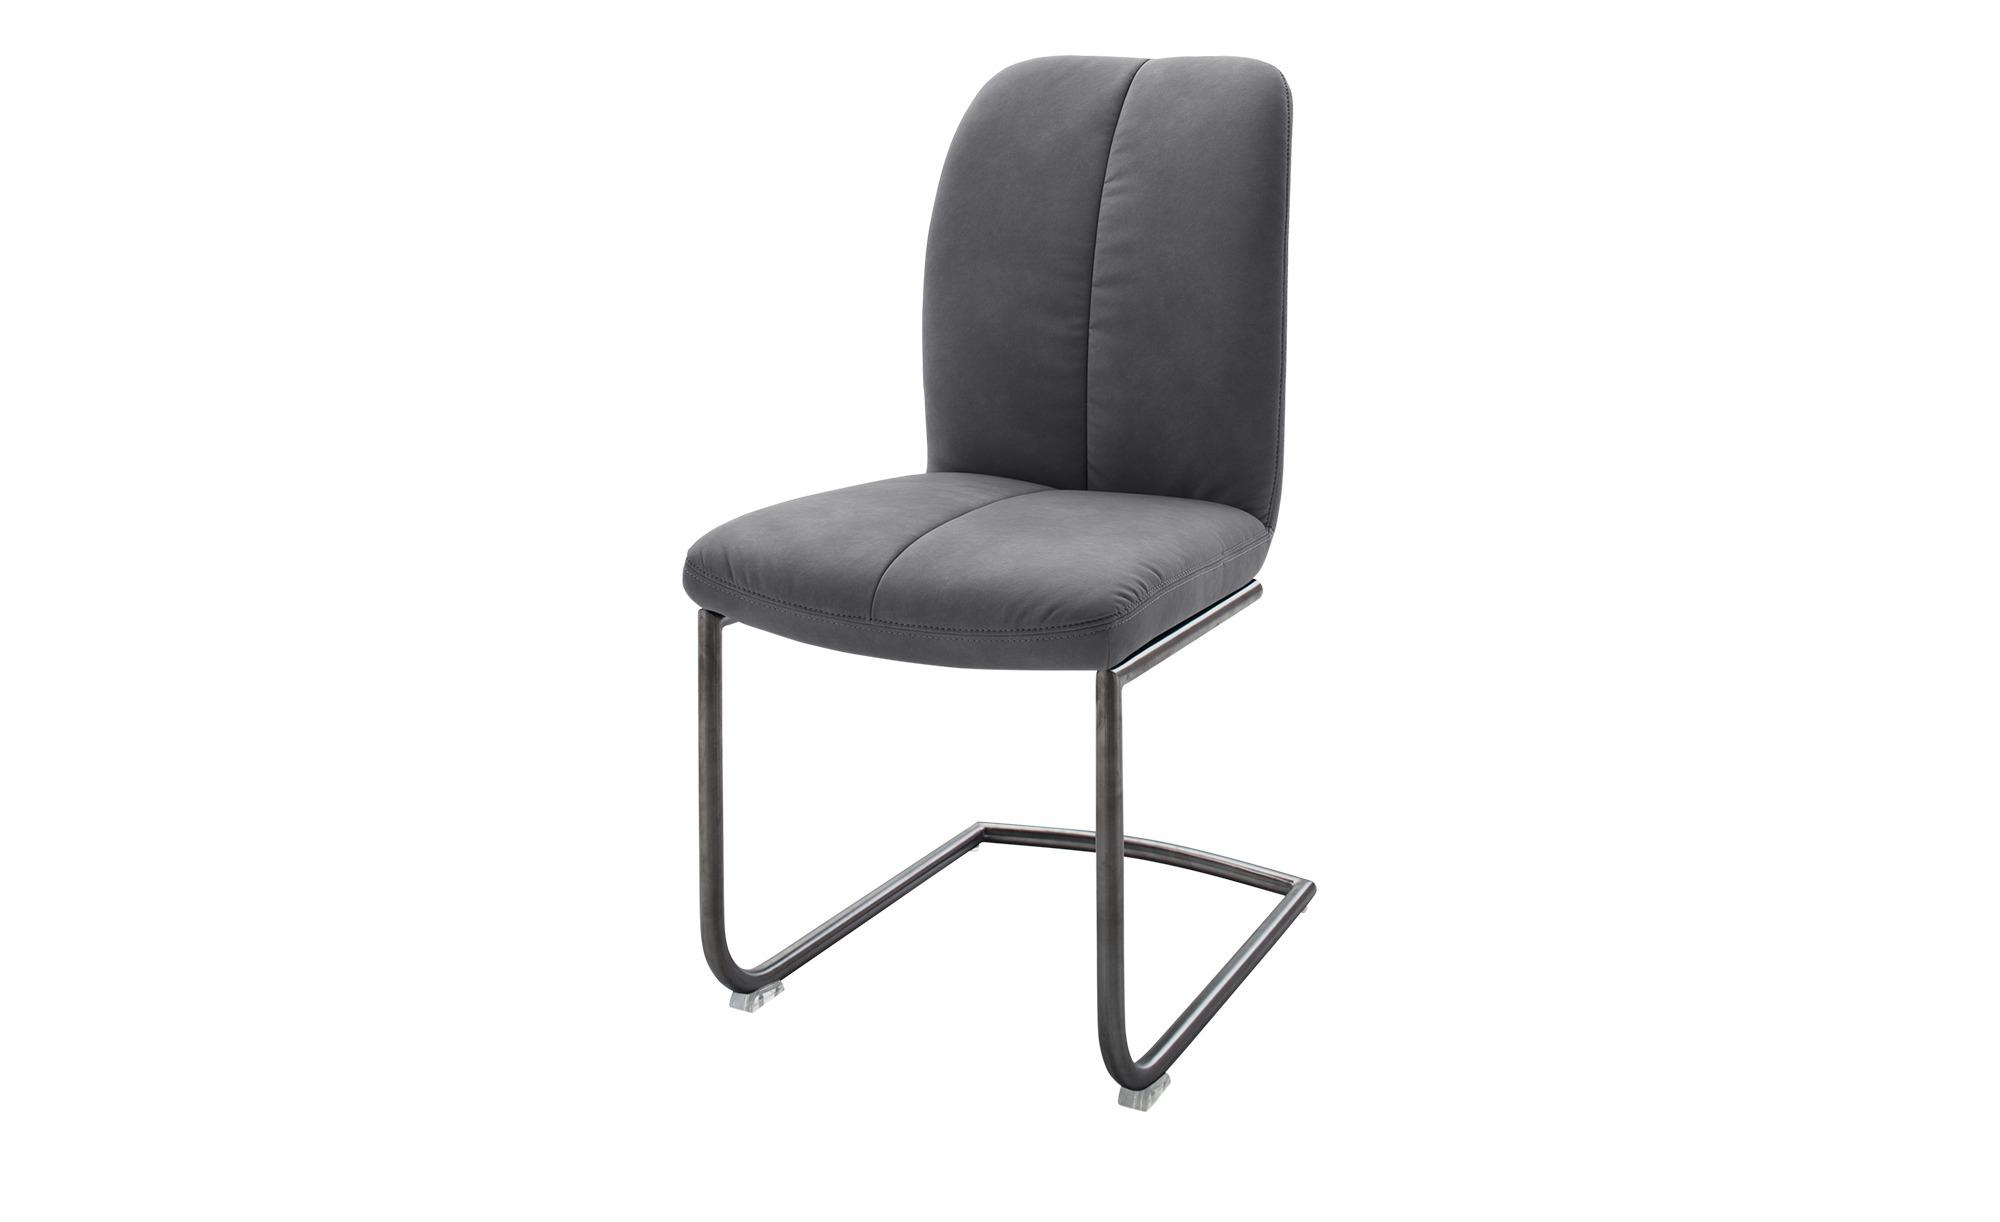 Stuhl grau 46 cm 102 cm 58 cm Stühle > Esszimmerstühle Möbel Kraft